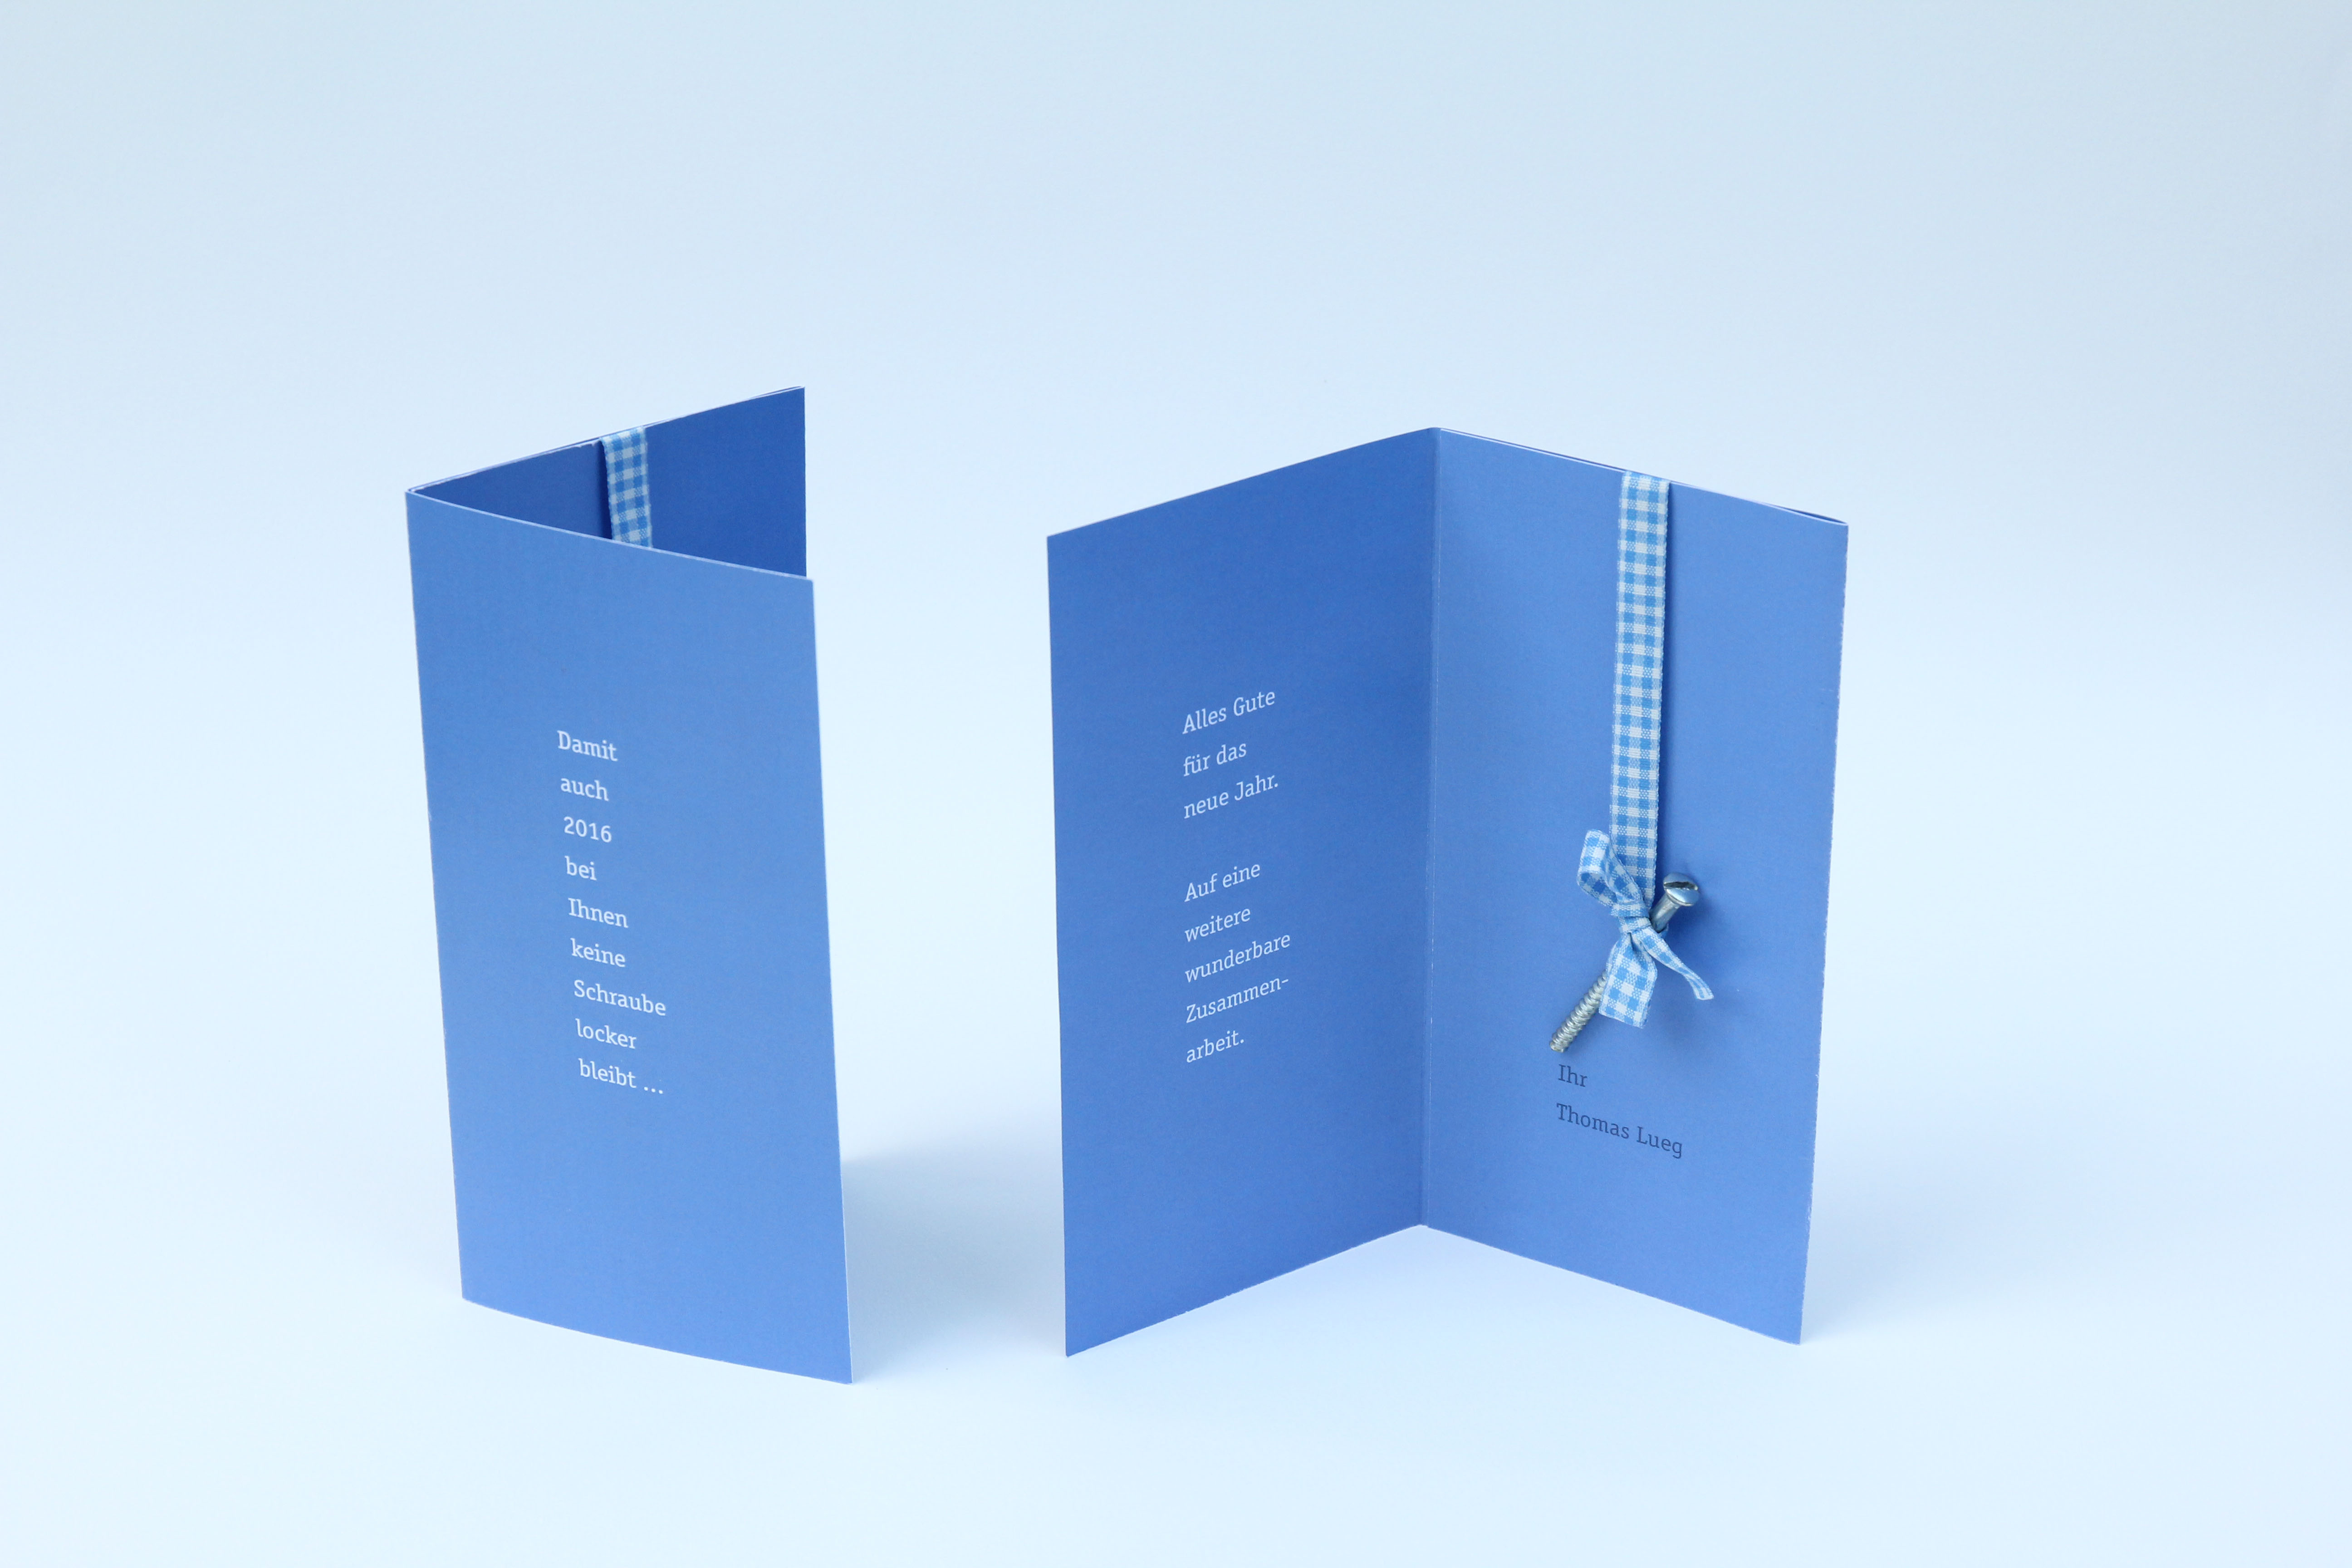 New Years Card 3 for a Carpenter by Daniela Franz - Creative Work